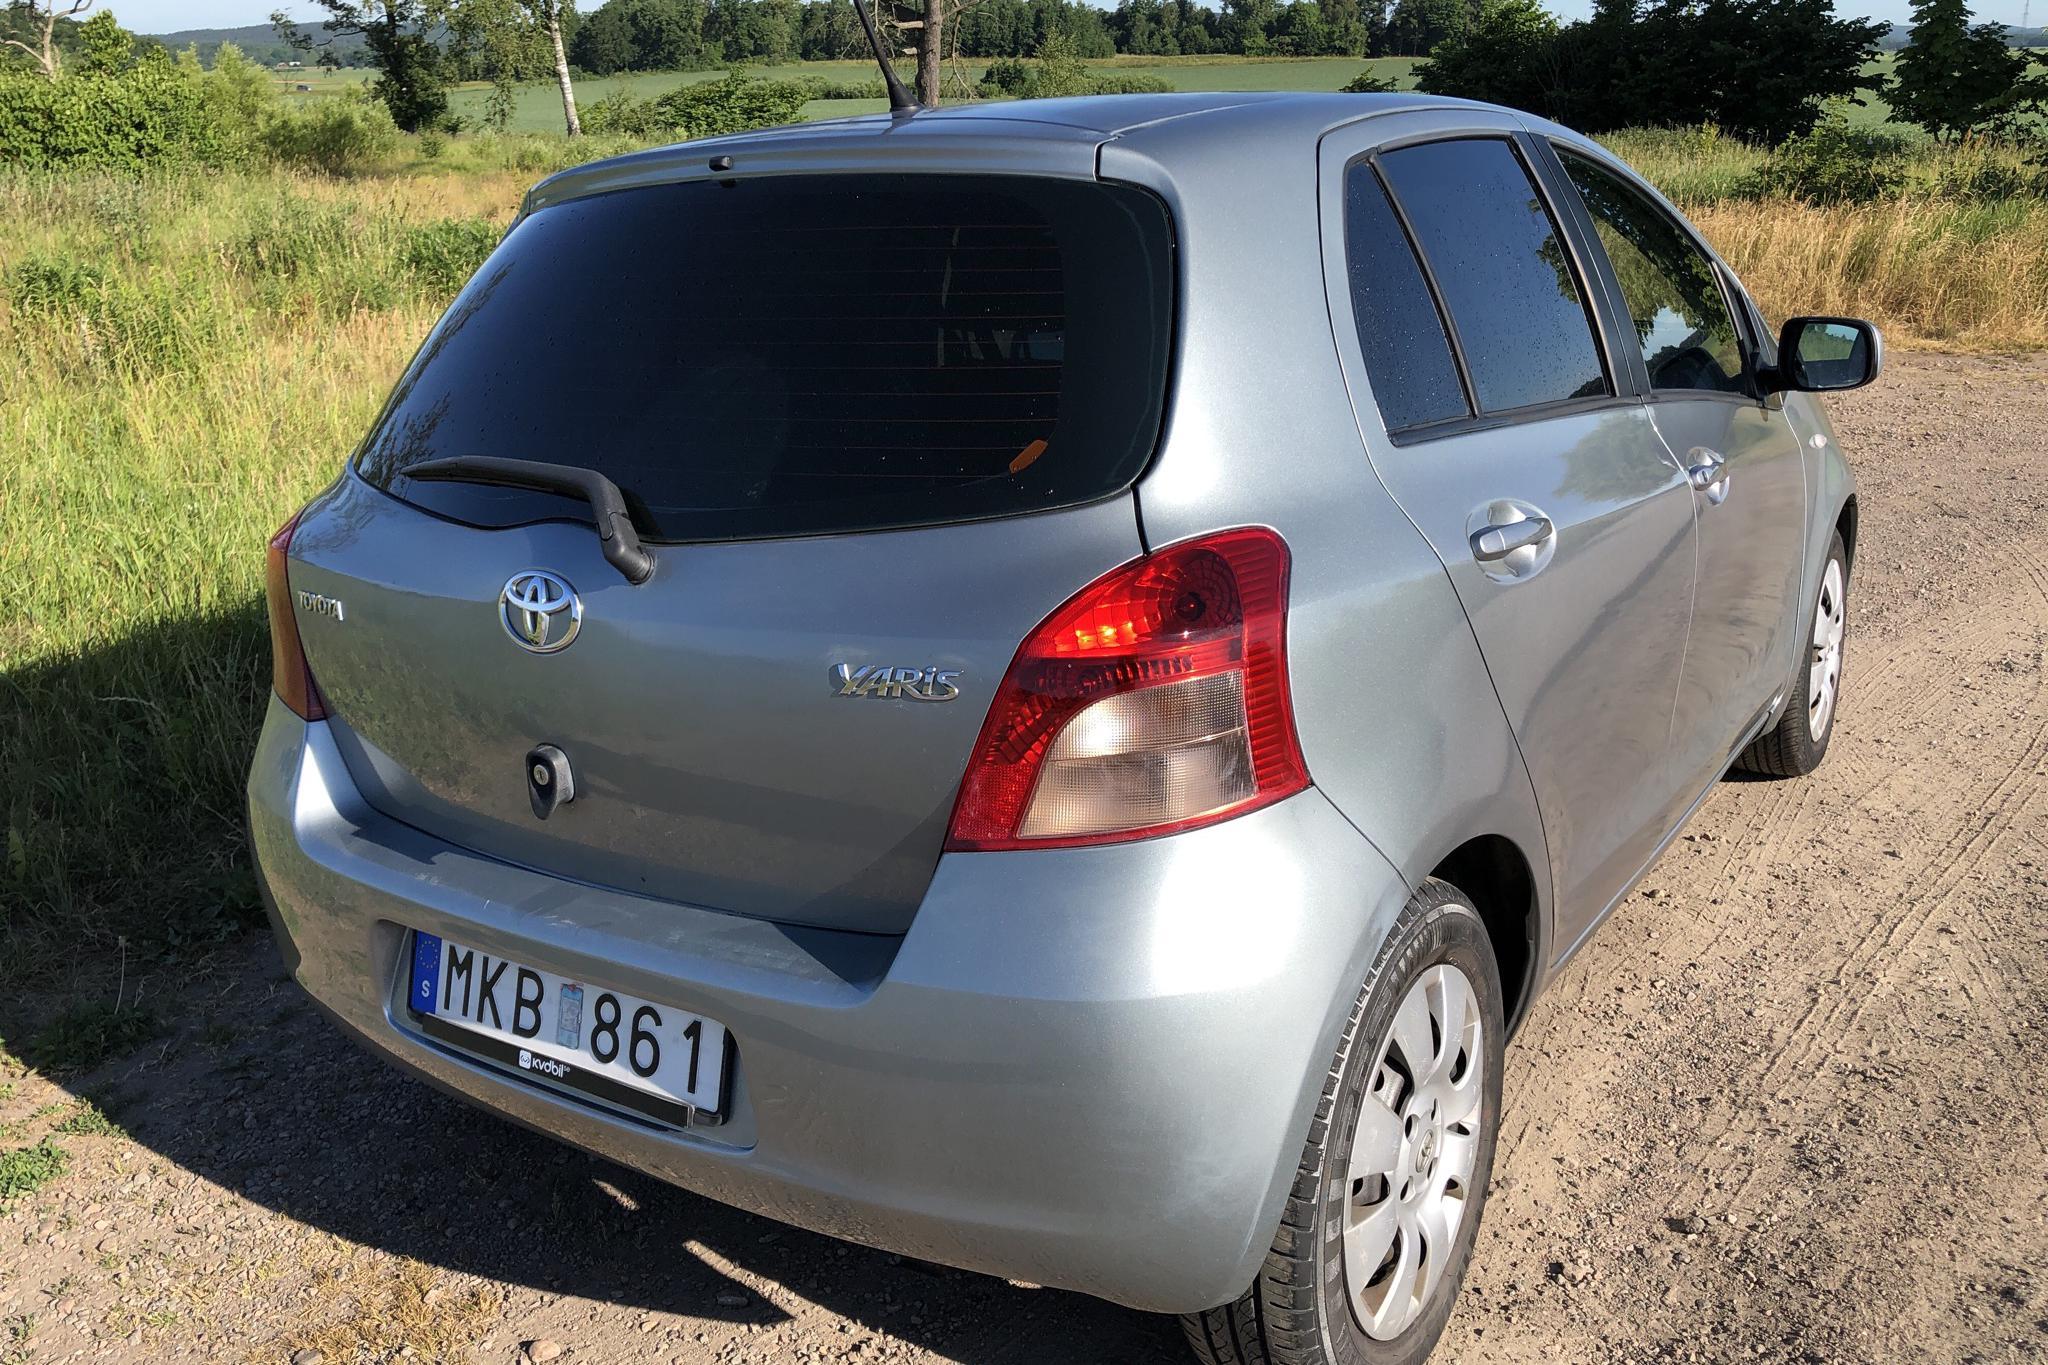 Toyota Yaris 1.3 5dr (87hk) - 136 130 km - Manual - gray - 2006